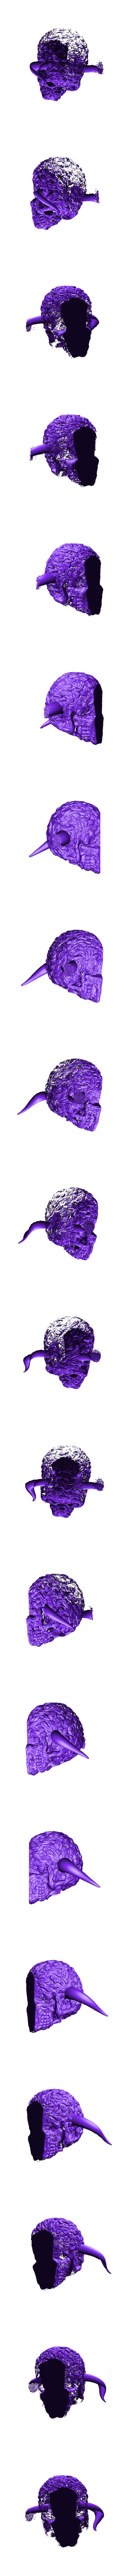 CALAVERA CORNUDA.stl Download free STL file Skull with horns. • 3D printer template, cocineroasturiano